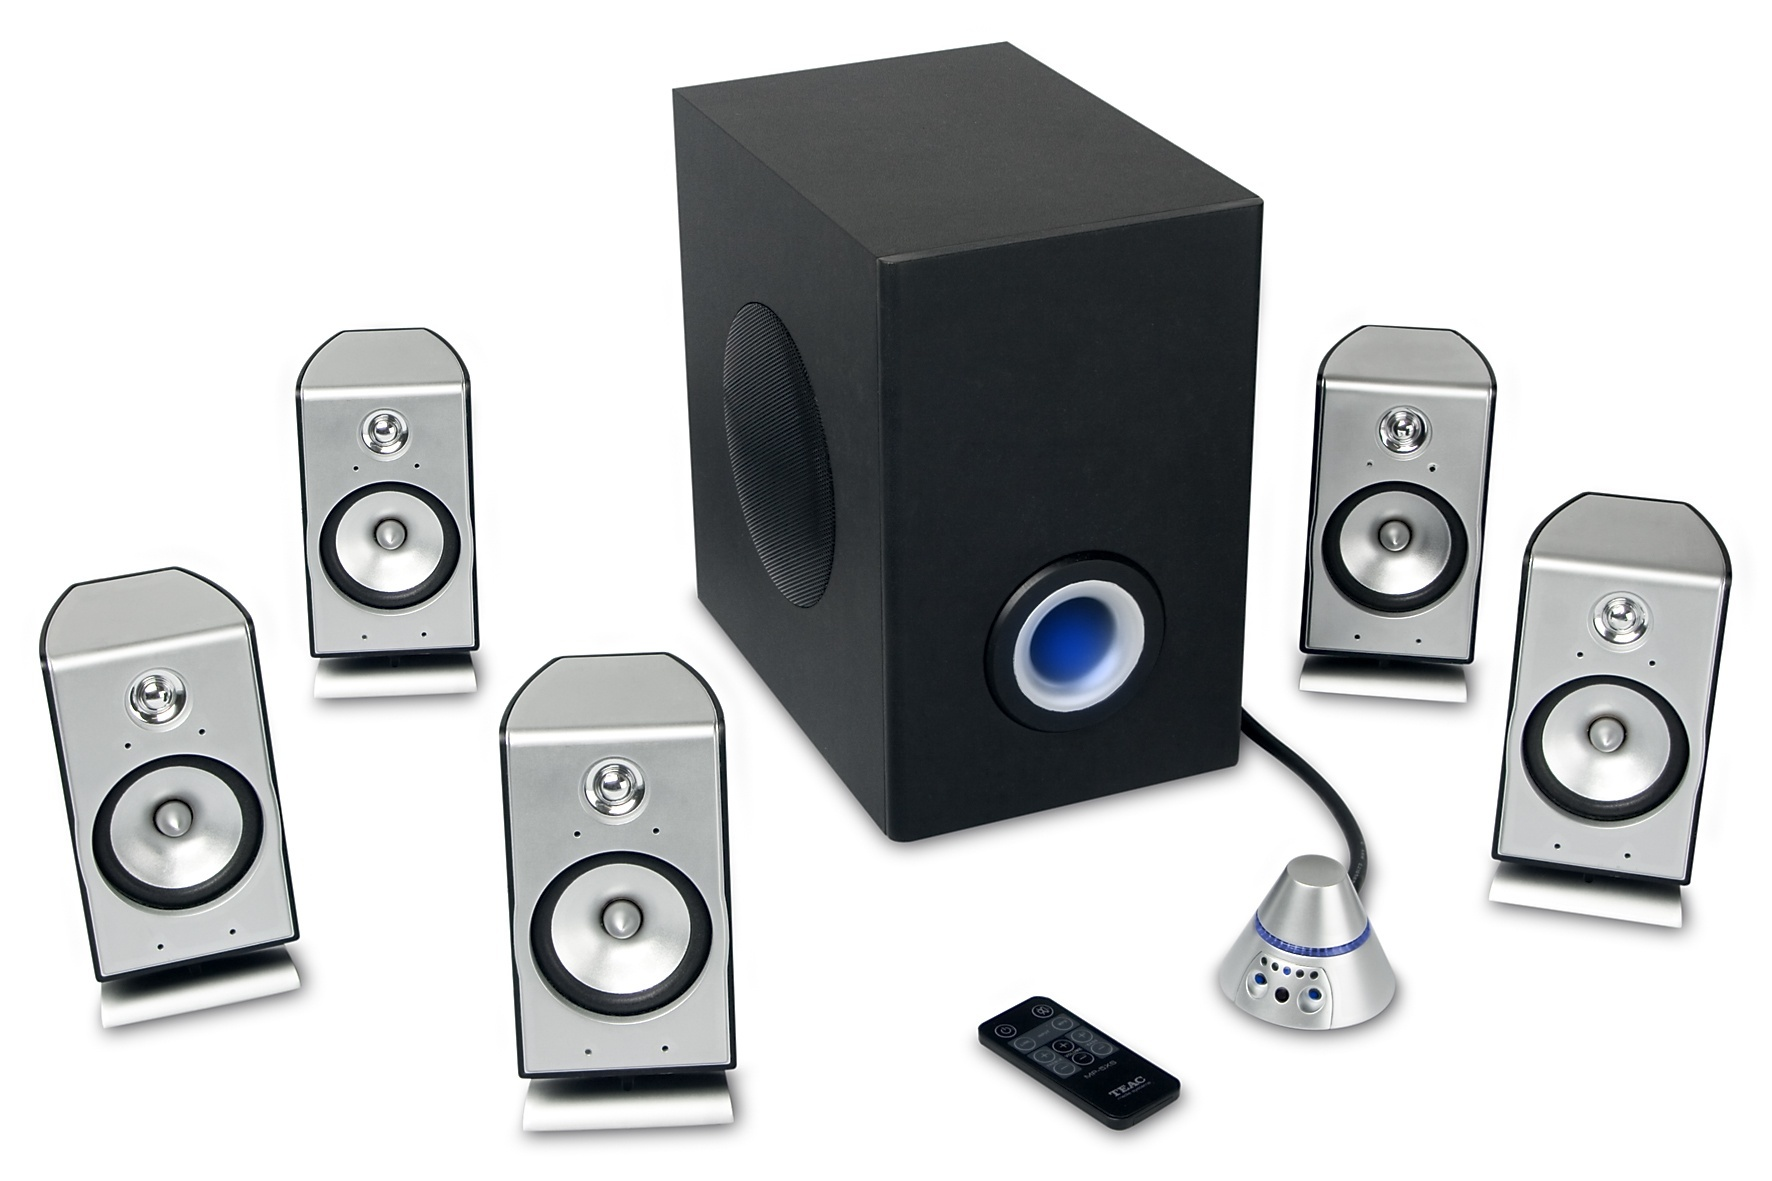 teac xt 6 gute 5 1 lautsprecher zum kleinen preis gamestar. Black Bedroom Furniture Sets. Home Design Ideas